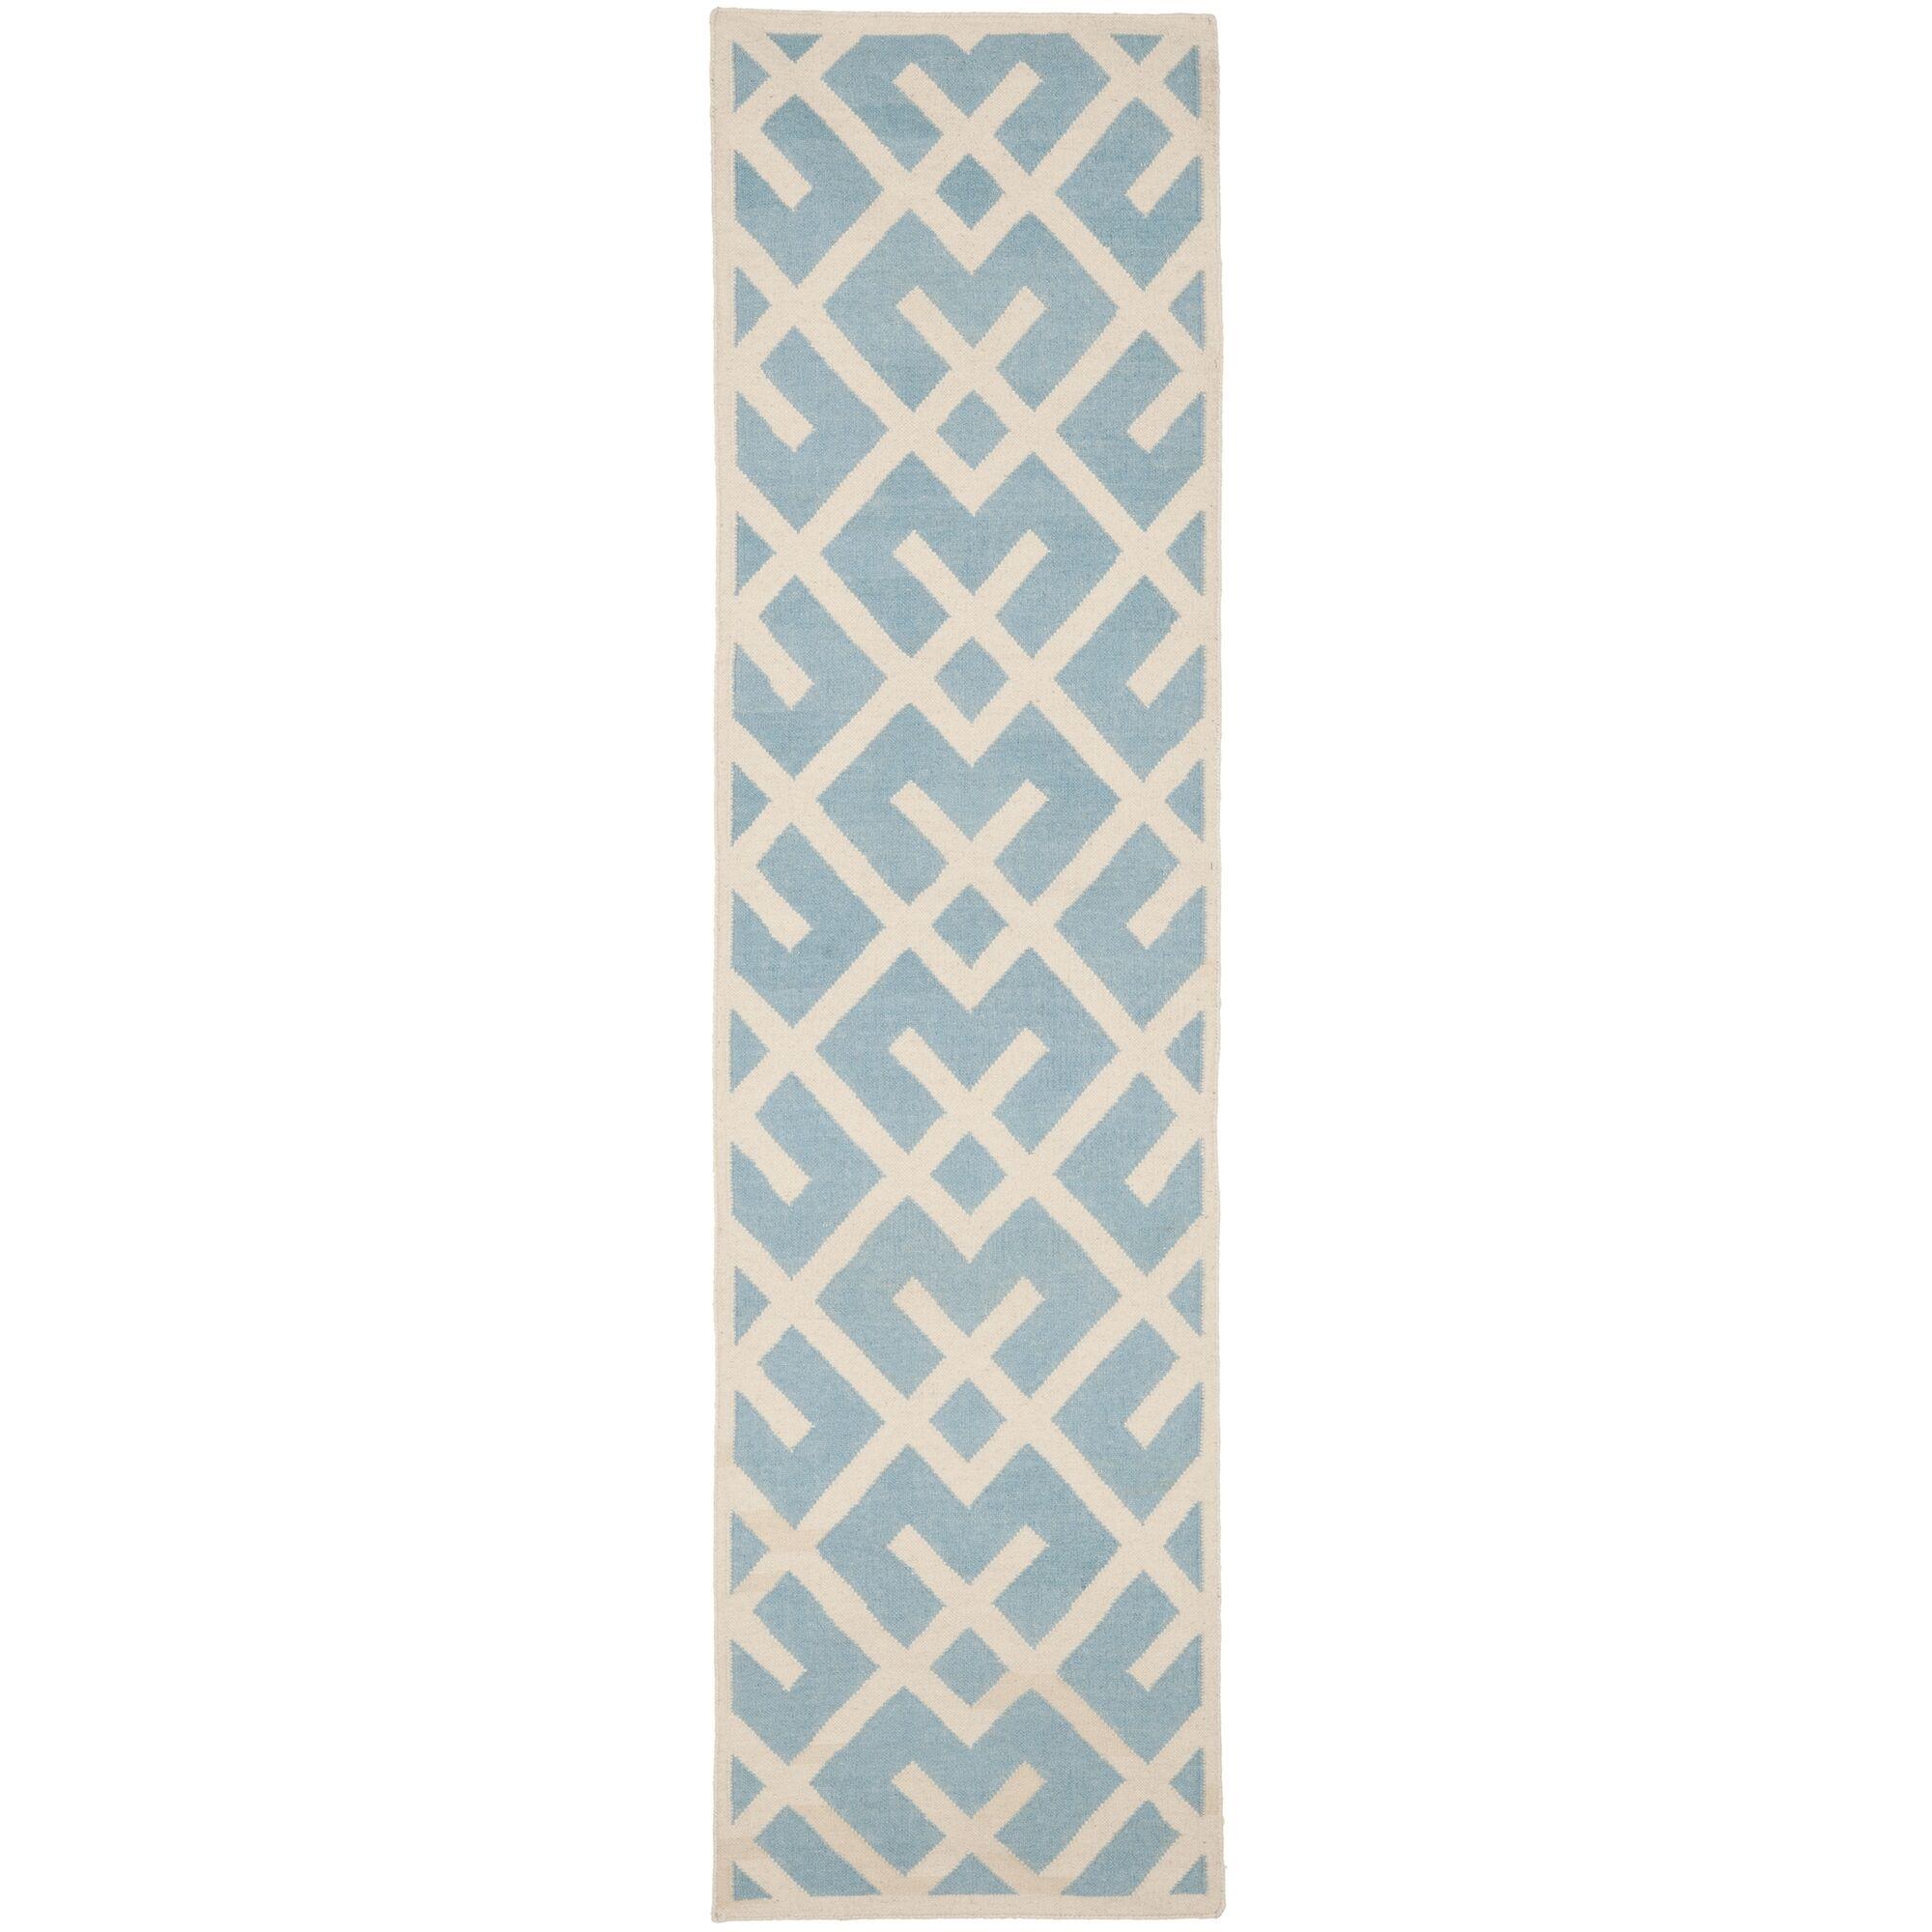 Cassiopeia Handmade Light Blue/Ivory Area Rug Rug Size: Runner 2'6